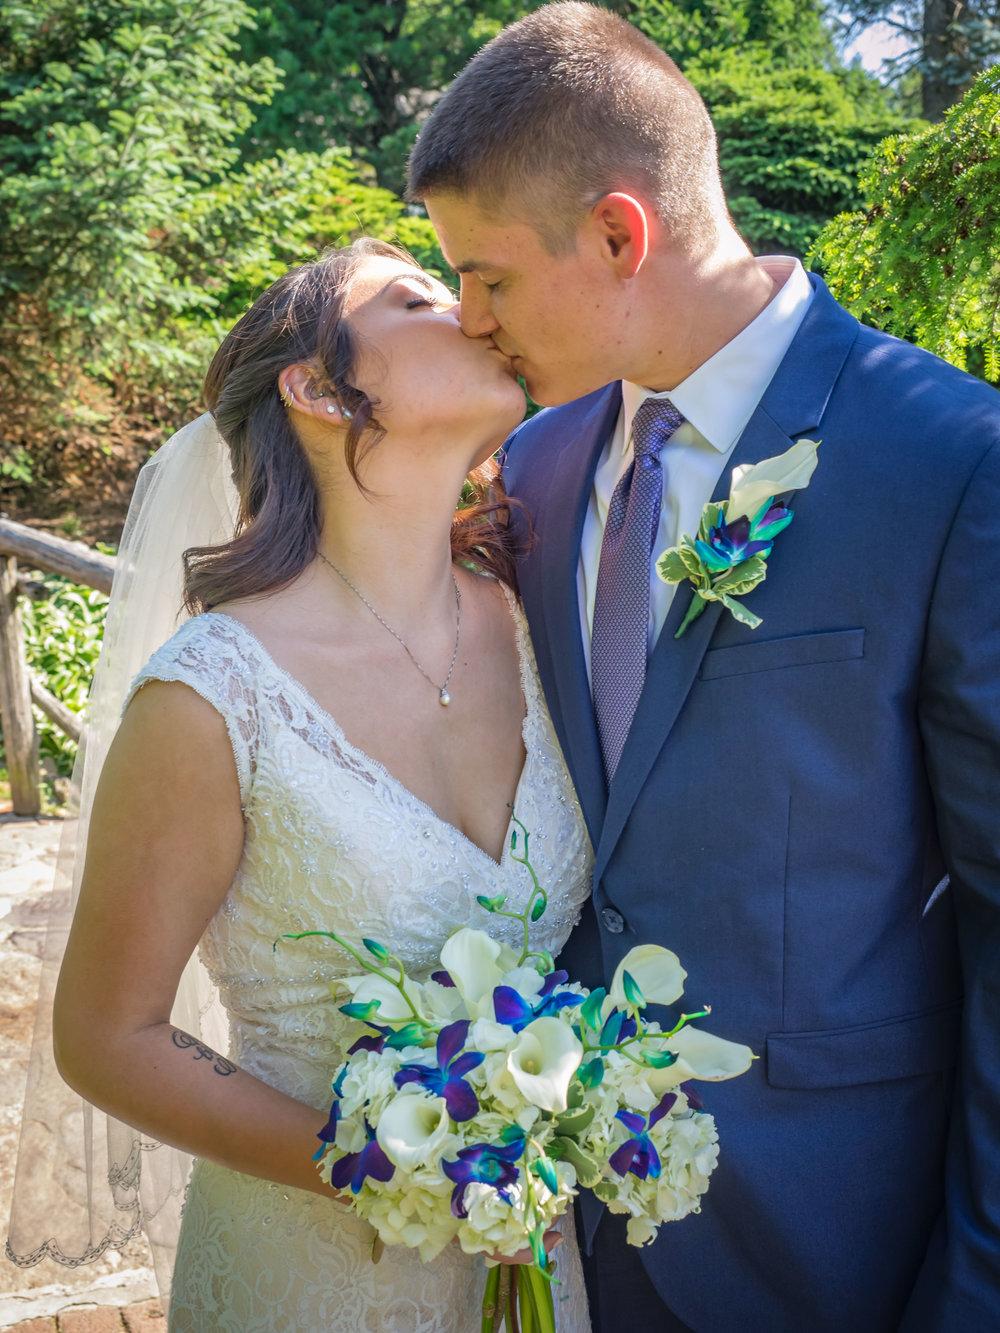 17 - Haines Couple - 20180616 - Haines -67522.jpg